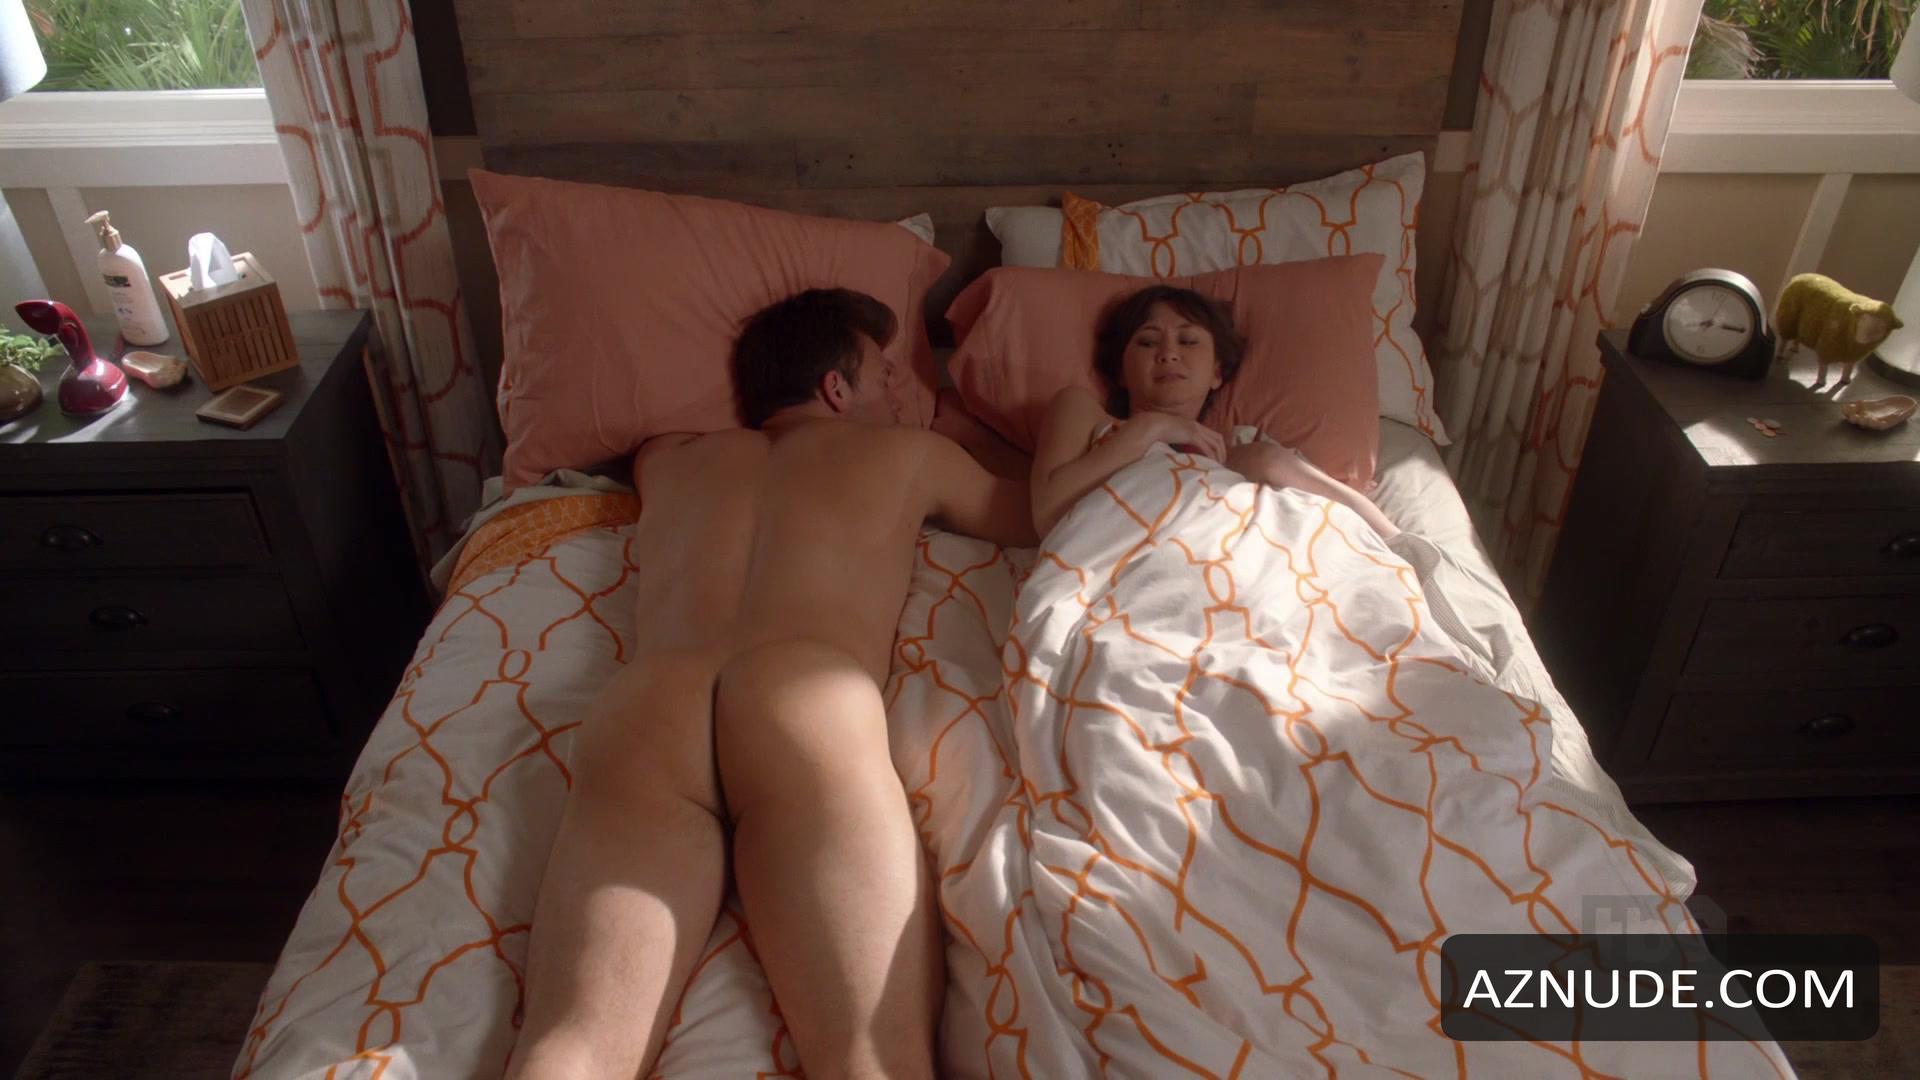 Jimmy Tatro Nude